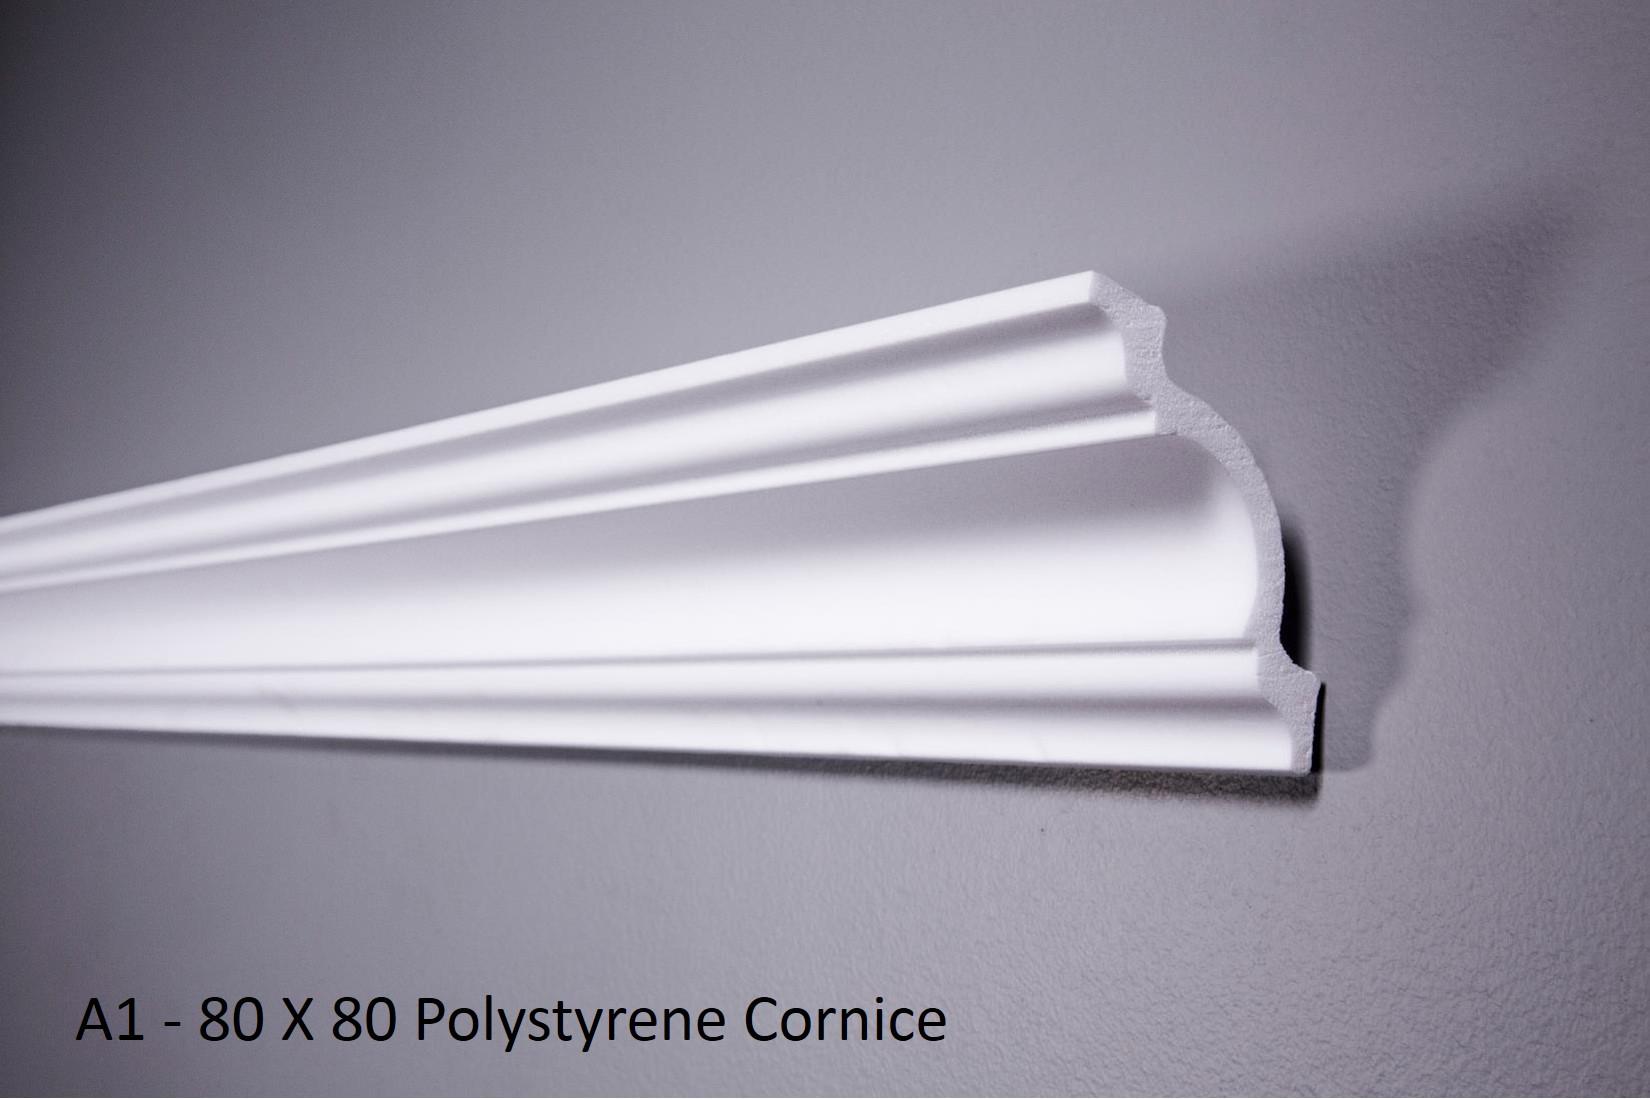 A1 - 80 X 80 Polystyrene Cornice